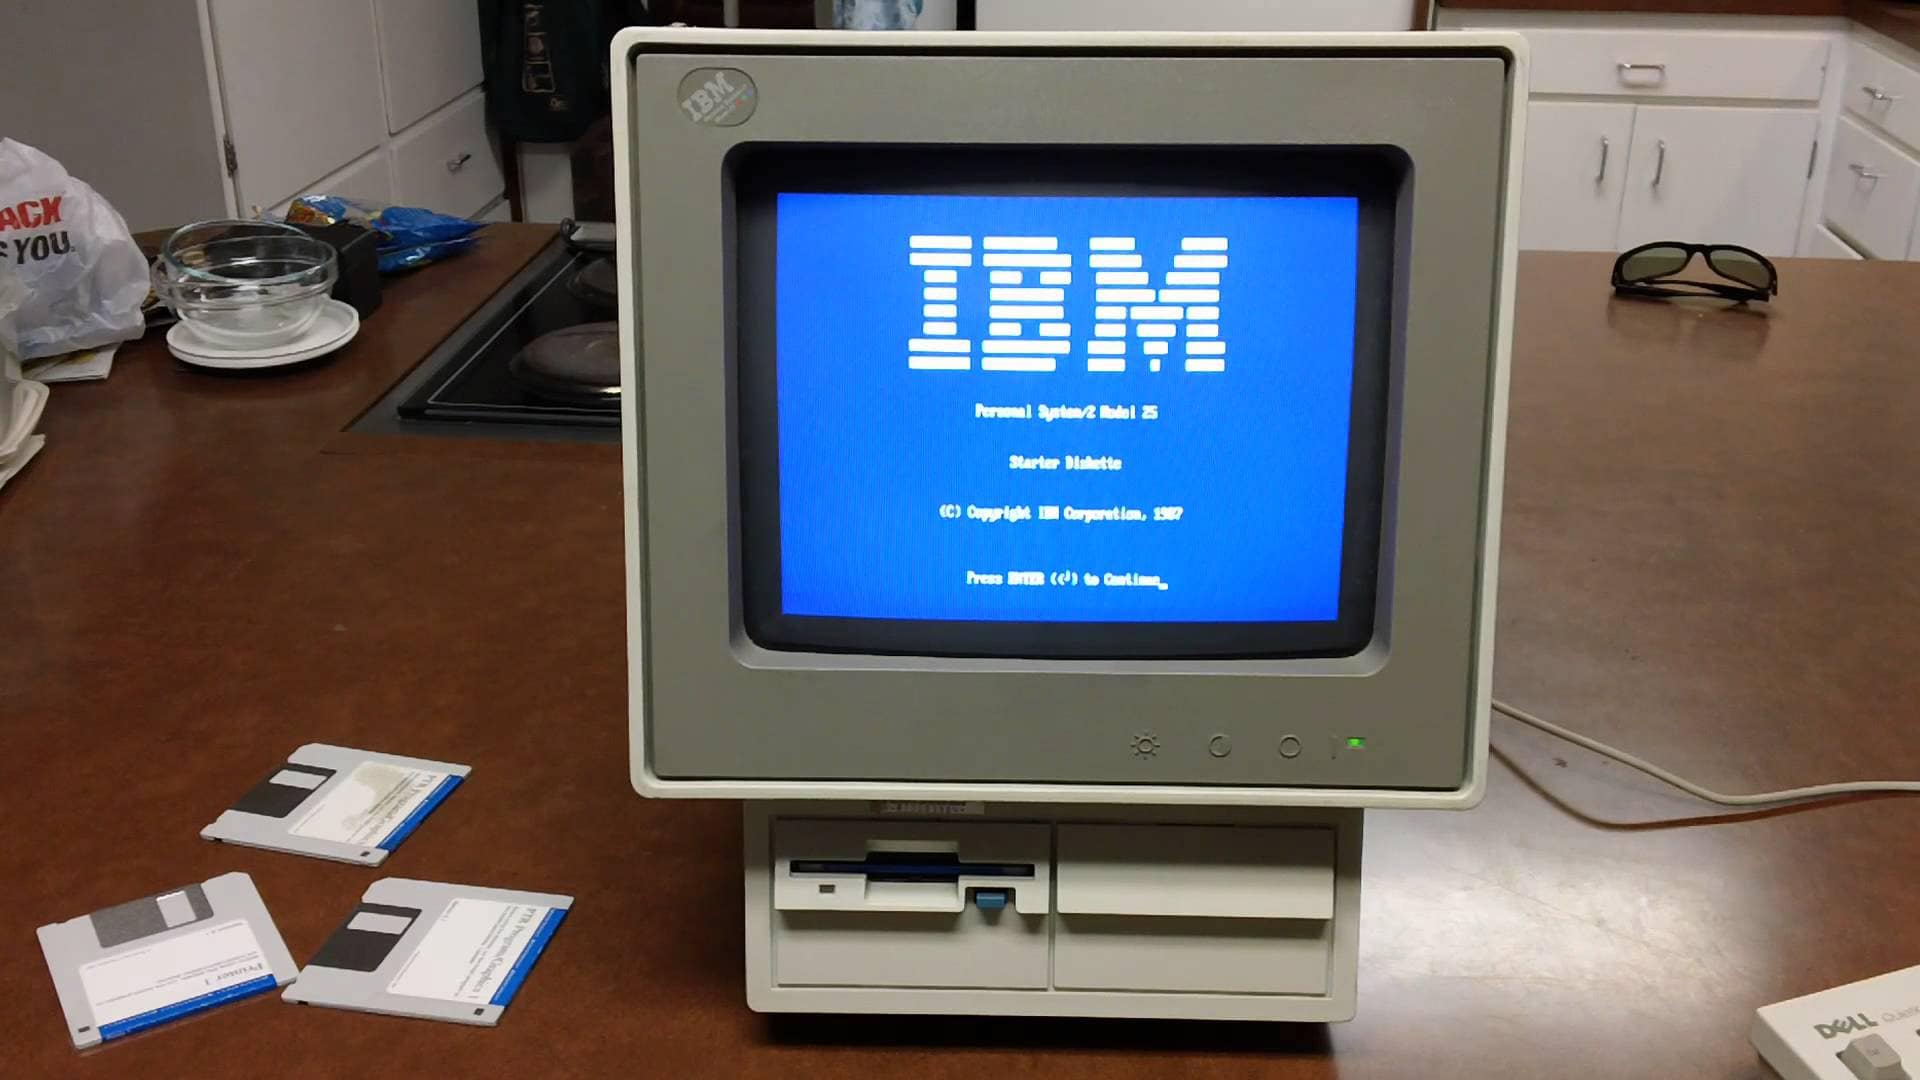 IBM PS2 ความผิดพลาดที่ไม่น่าให้อภัยของ IBM